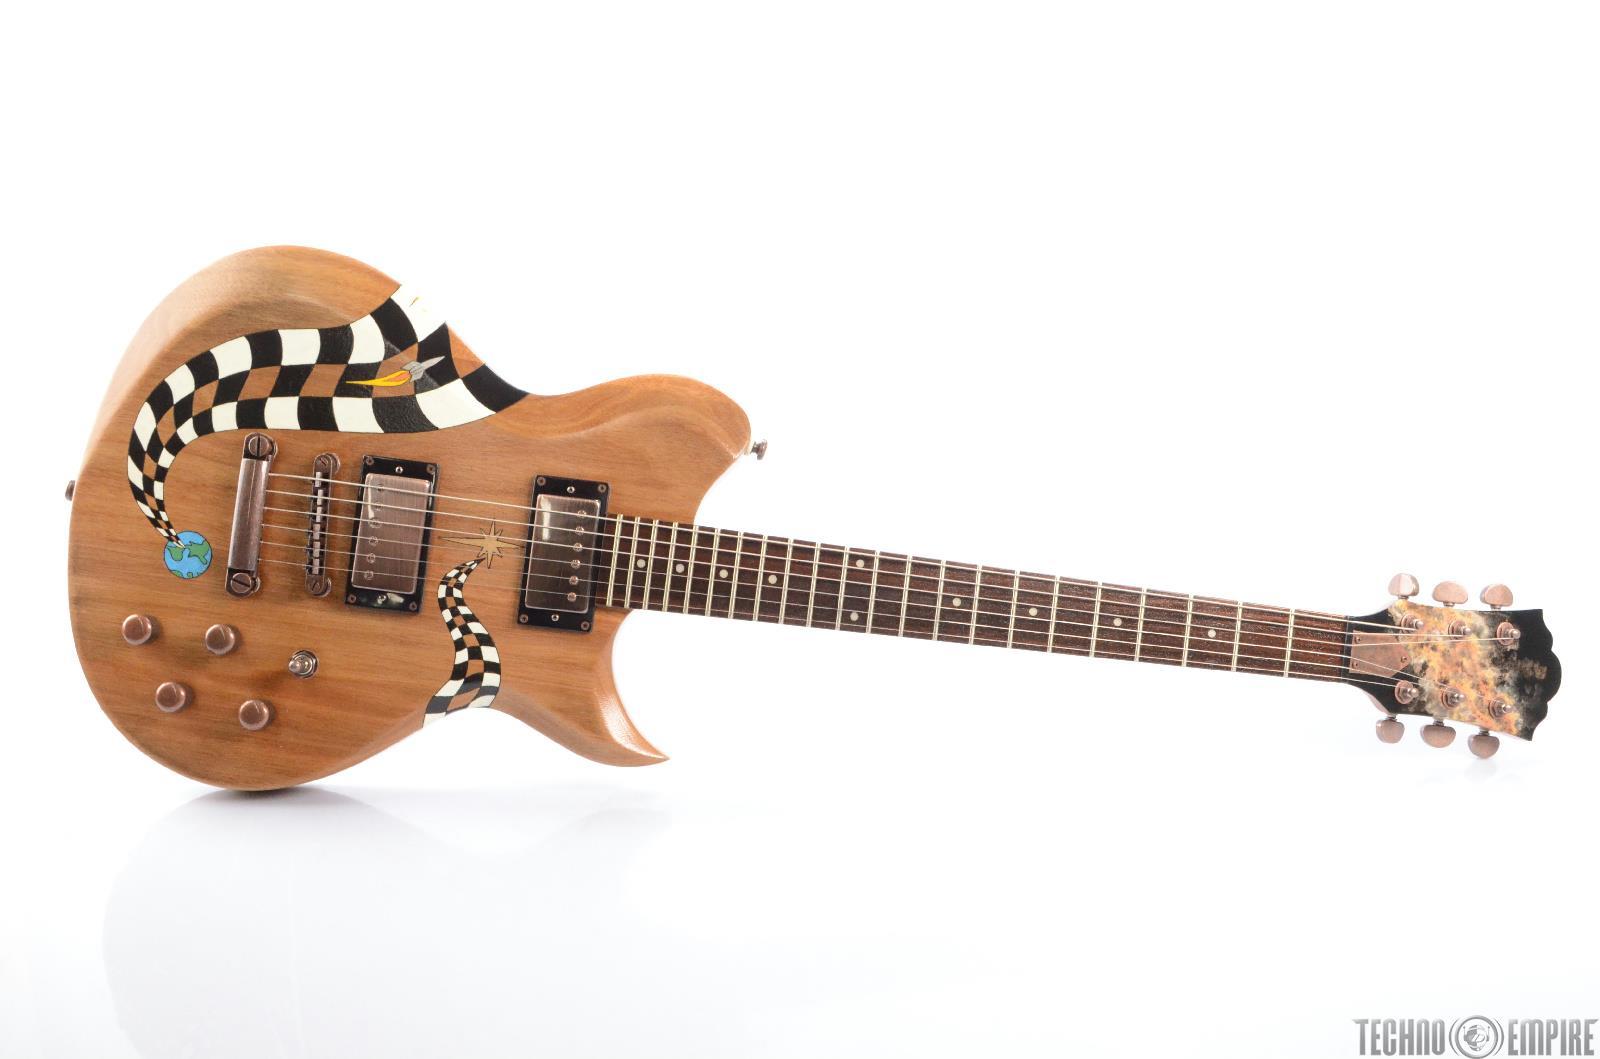 Custom WASHBURN WI64 Lightspeed Electric Guitar w/ Roland Micro Cube Amp #23422